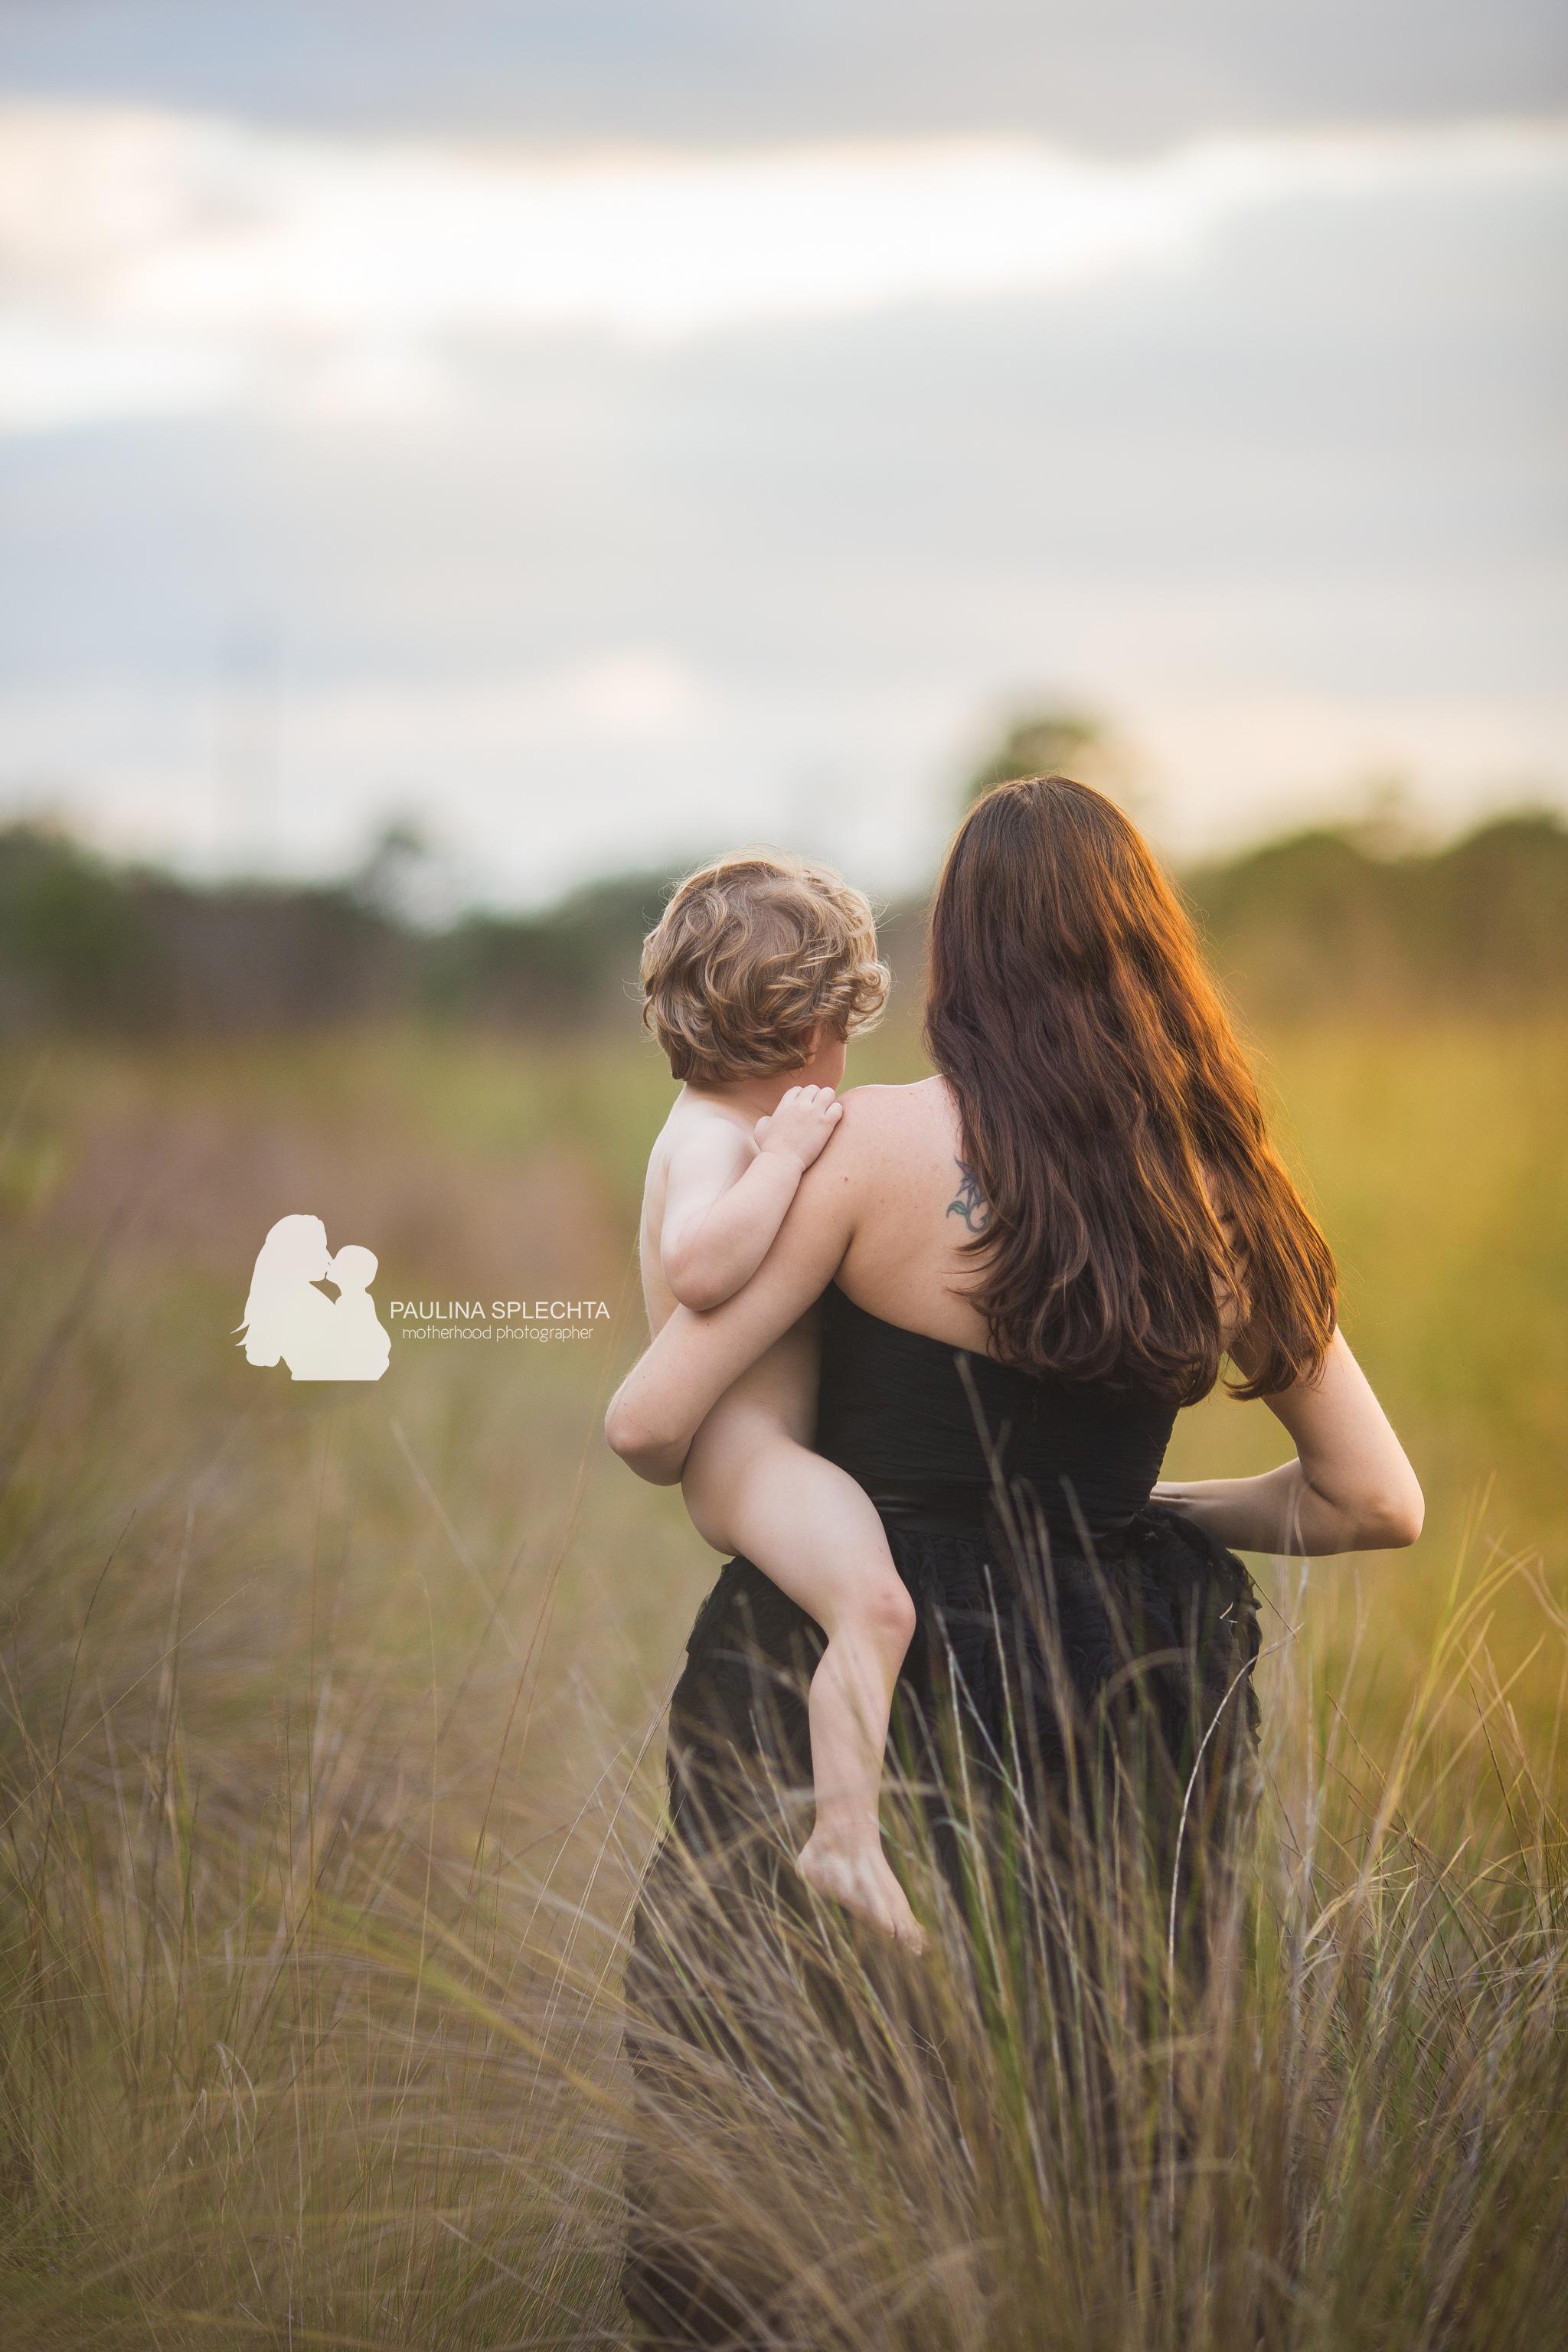 paulina-splechta-boca-birth-photographer-bocabirthphotographer-south-florida-birth-photographer-maternityphotographer-pregnancy-motherhood-10.jpg